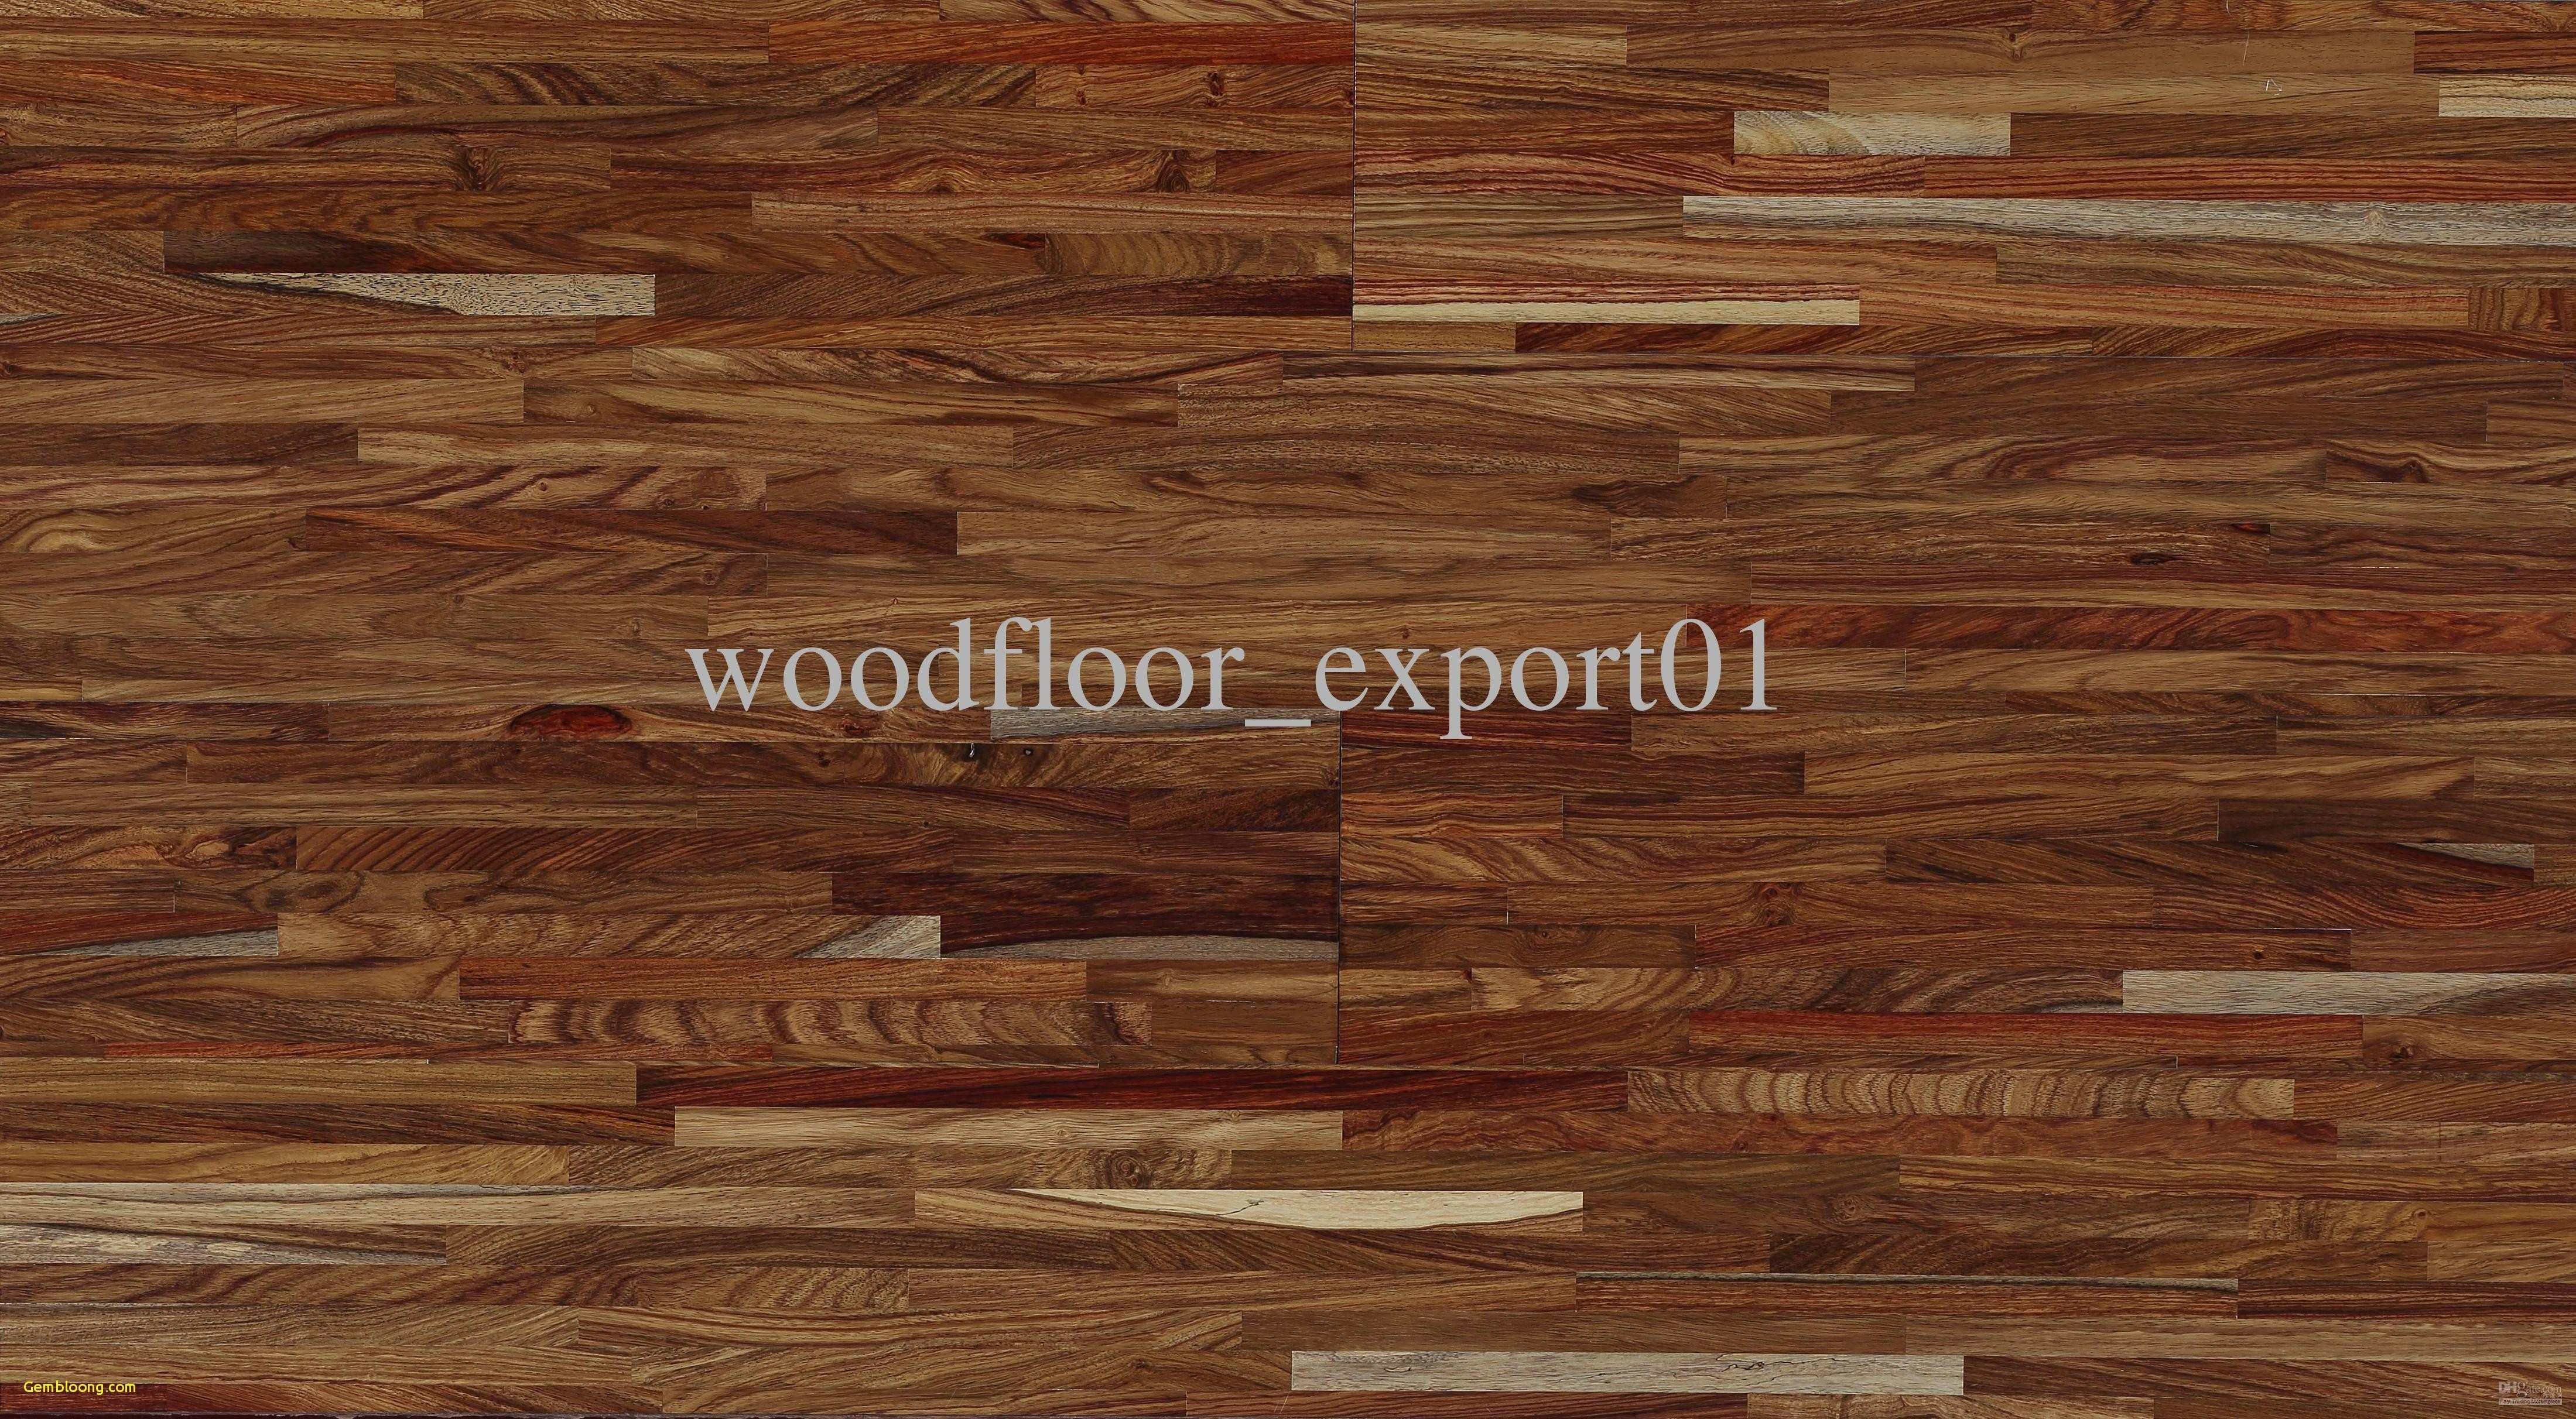 hardwood flooring stores nj of hardwood flooring designs facesinnature within hardwood flooring designs flooring nj furniture design hard wood flooring new 0d grace place